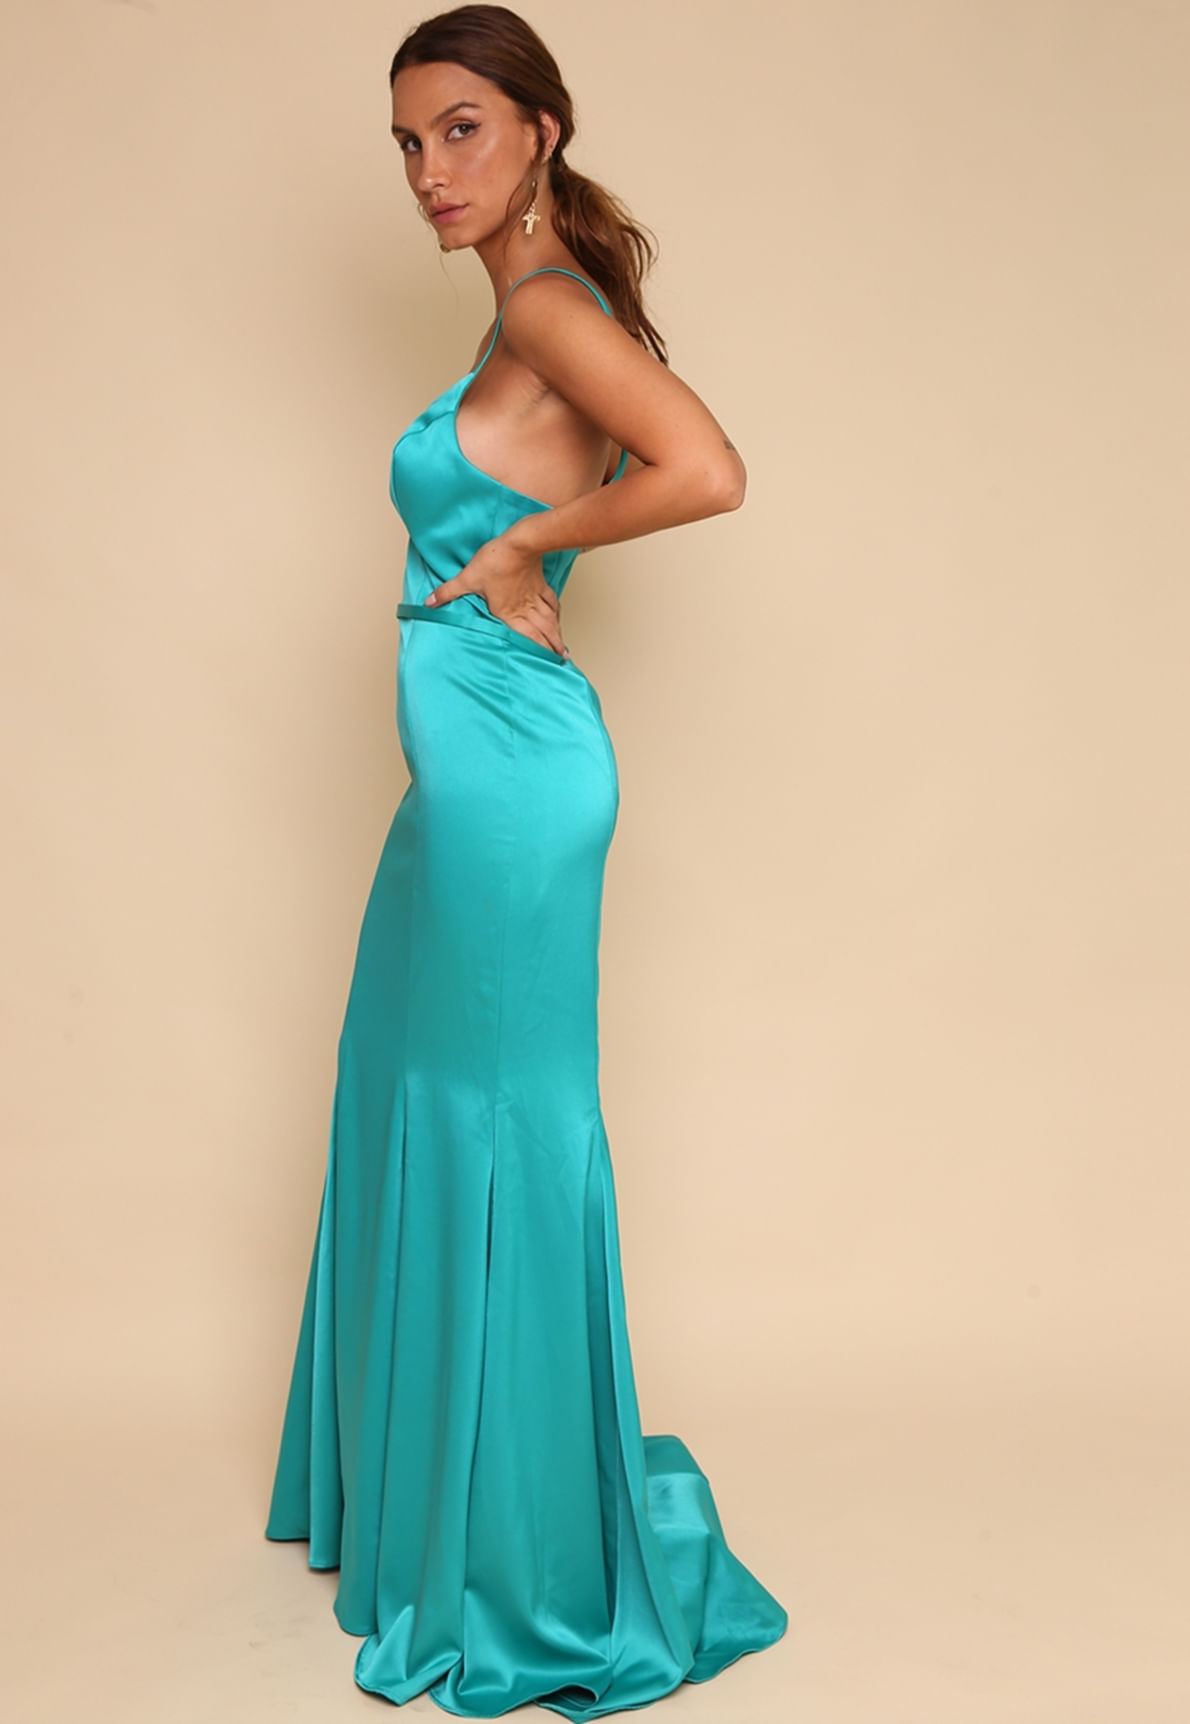 30870-vestido-longo-verde-agua-isadora-mundo-lolita-03